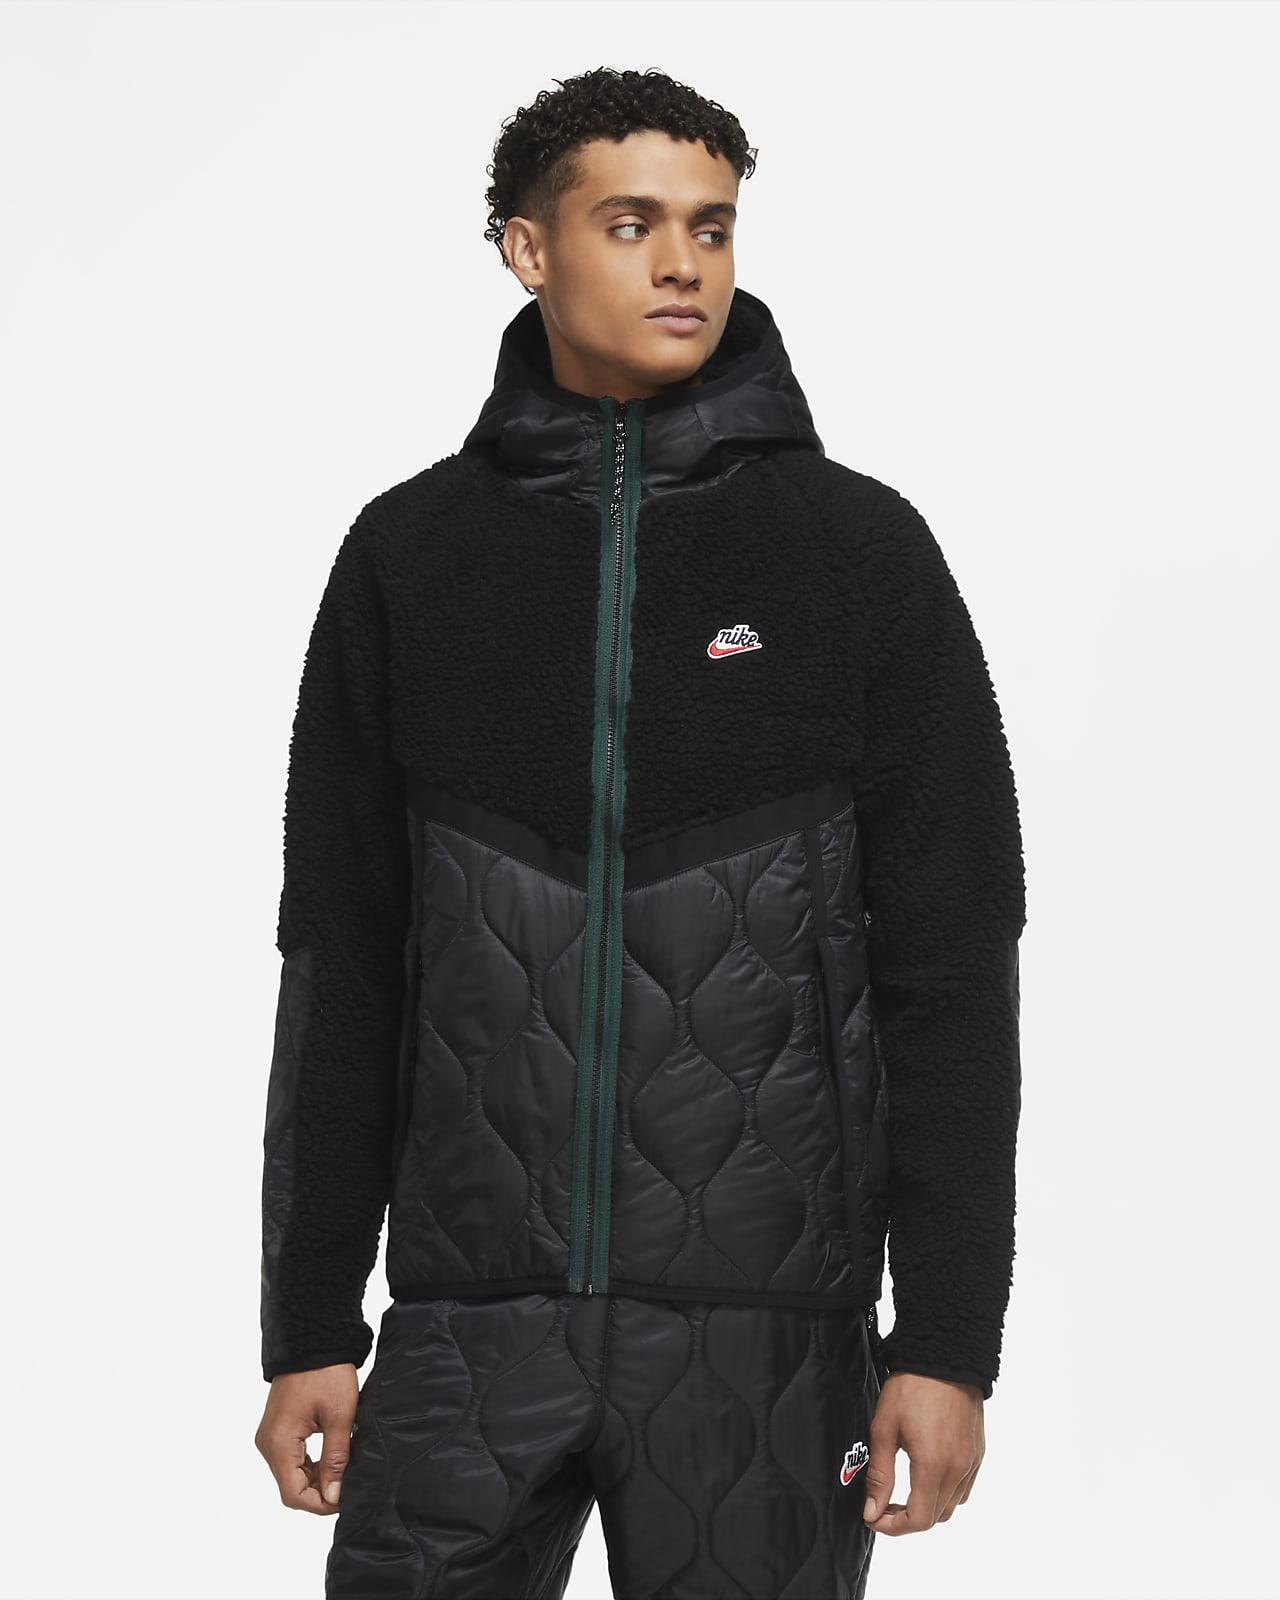 Indefinido facultativo Inadecuado  Nike Sportswear Heritage Men's Jacket. Nike GB